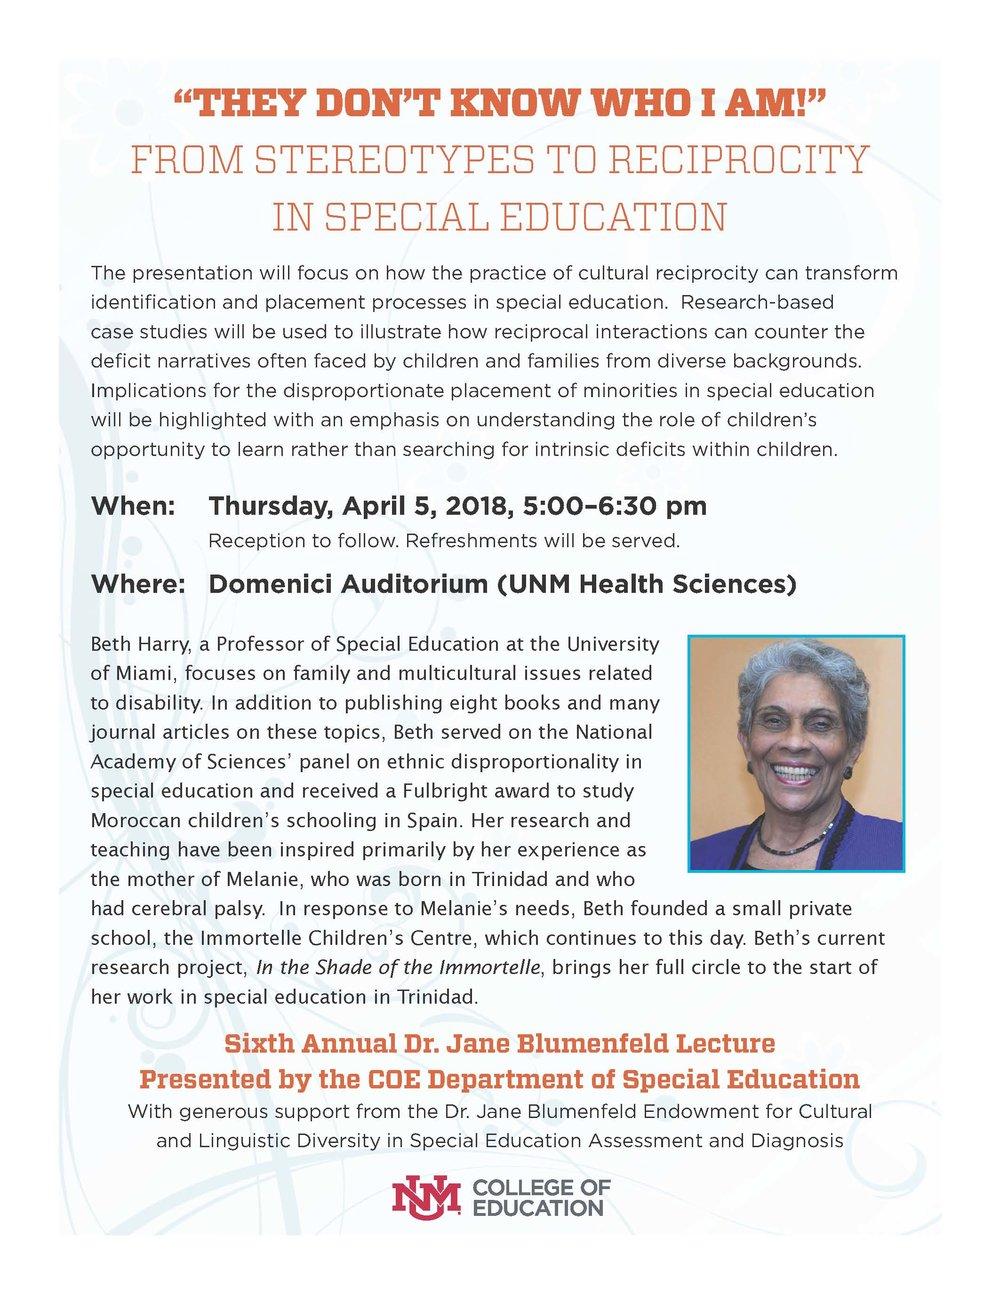 Dr. Jane Blumenfeld lecture flyer.2018.jpg